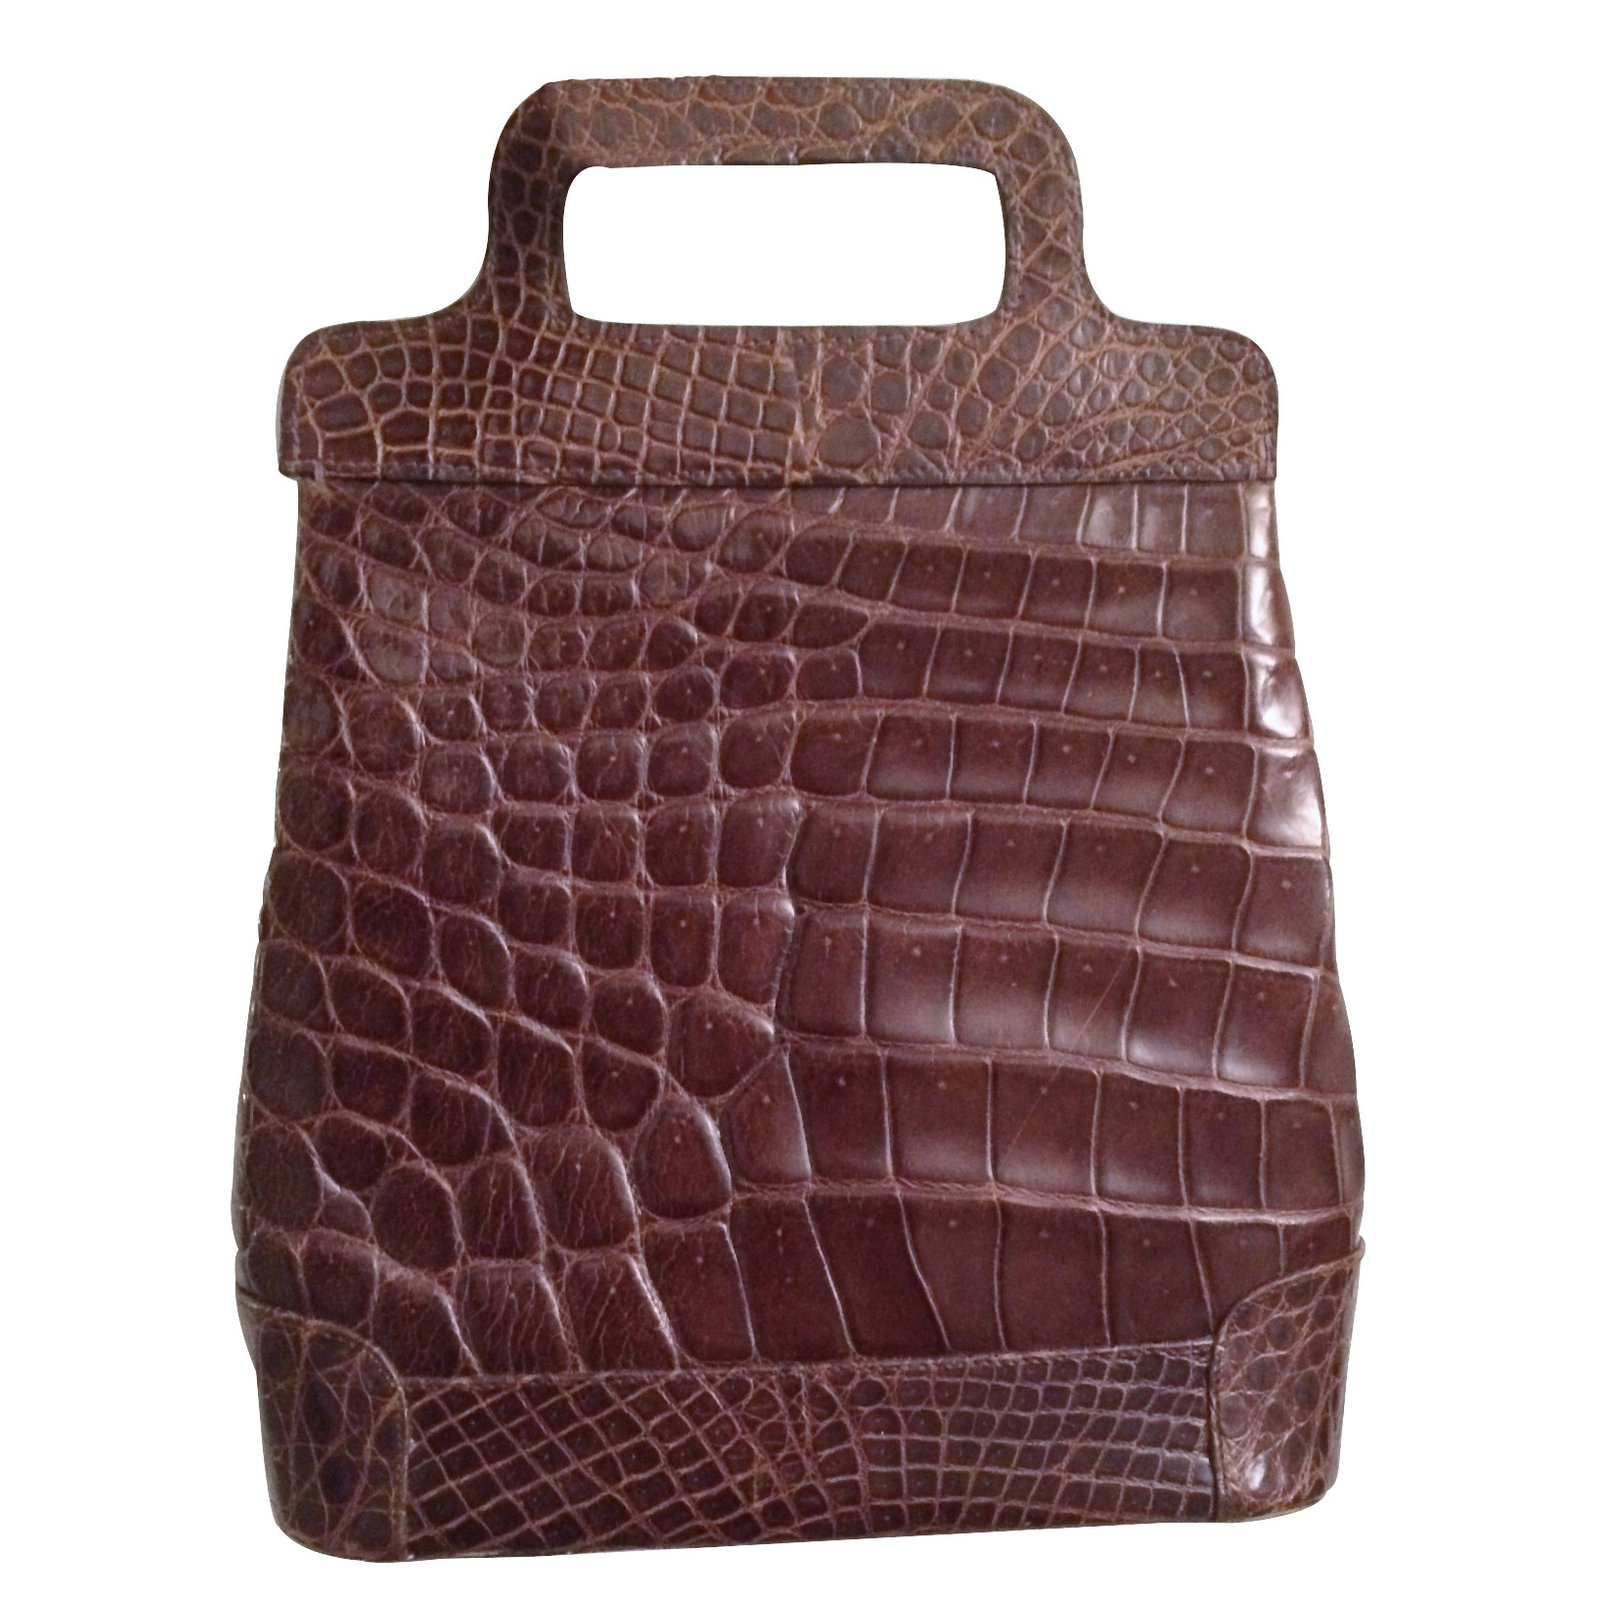 sacs main autre marque sac vintage crocodile cuirs. Black Bedroom Furniture Sets. Home Design Ideas